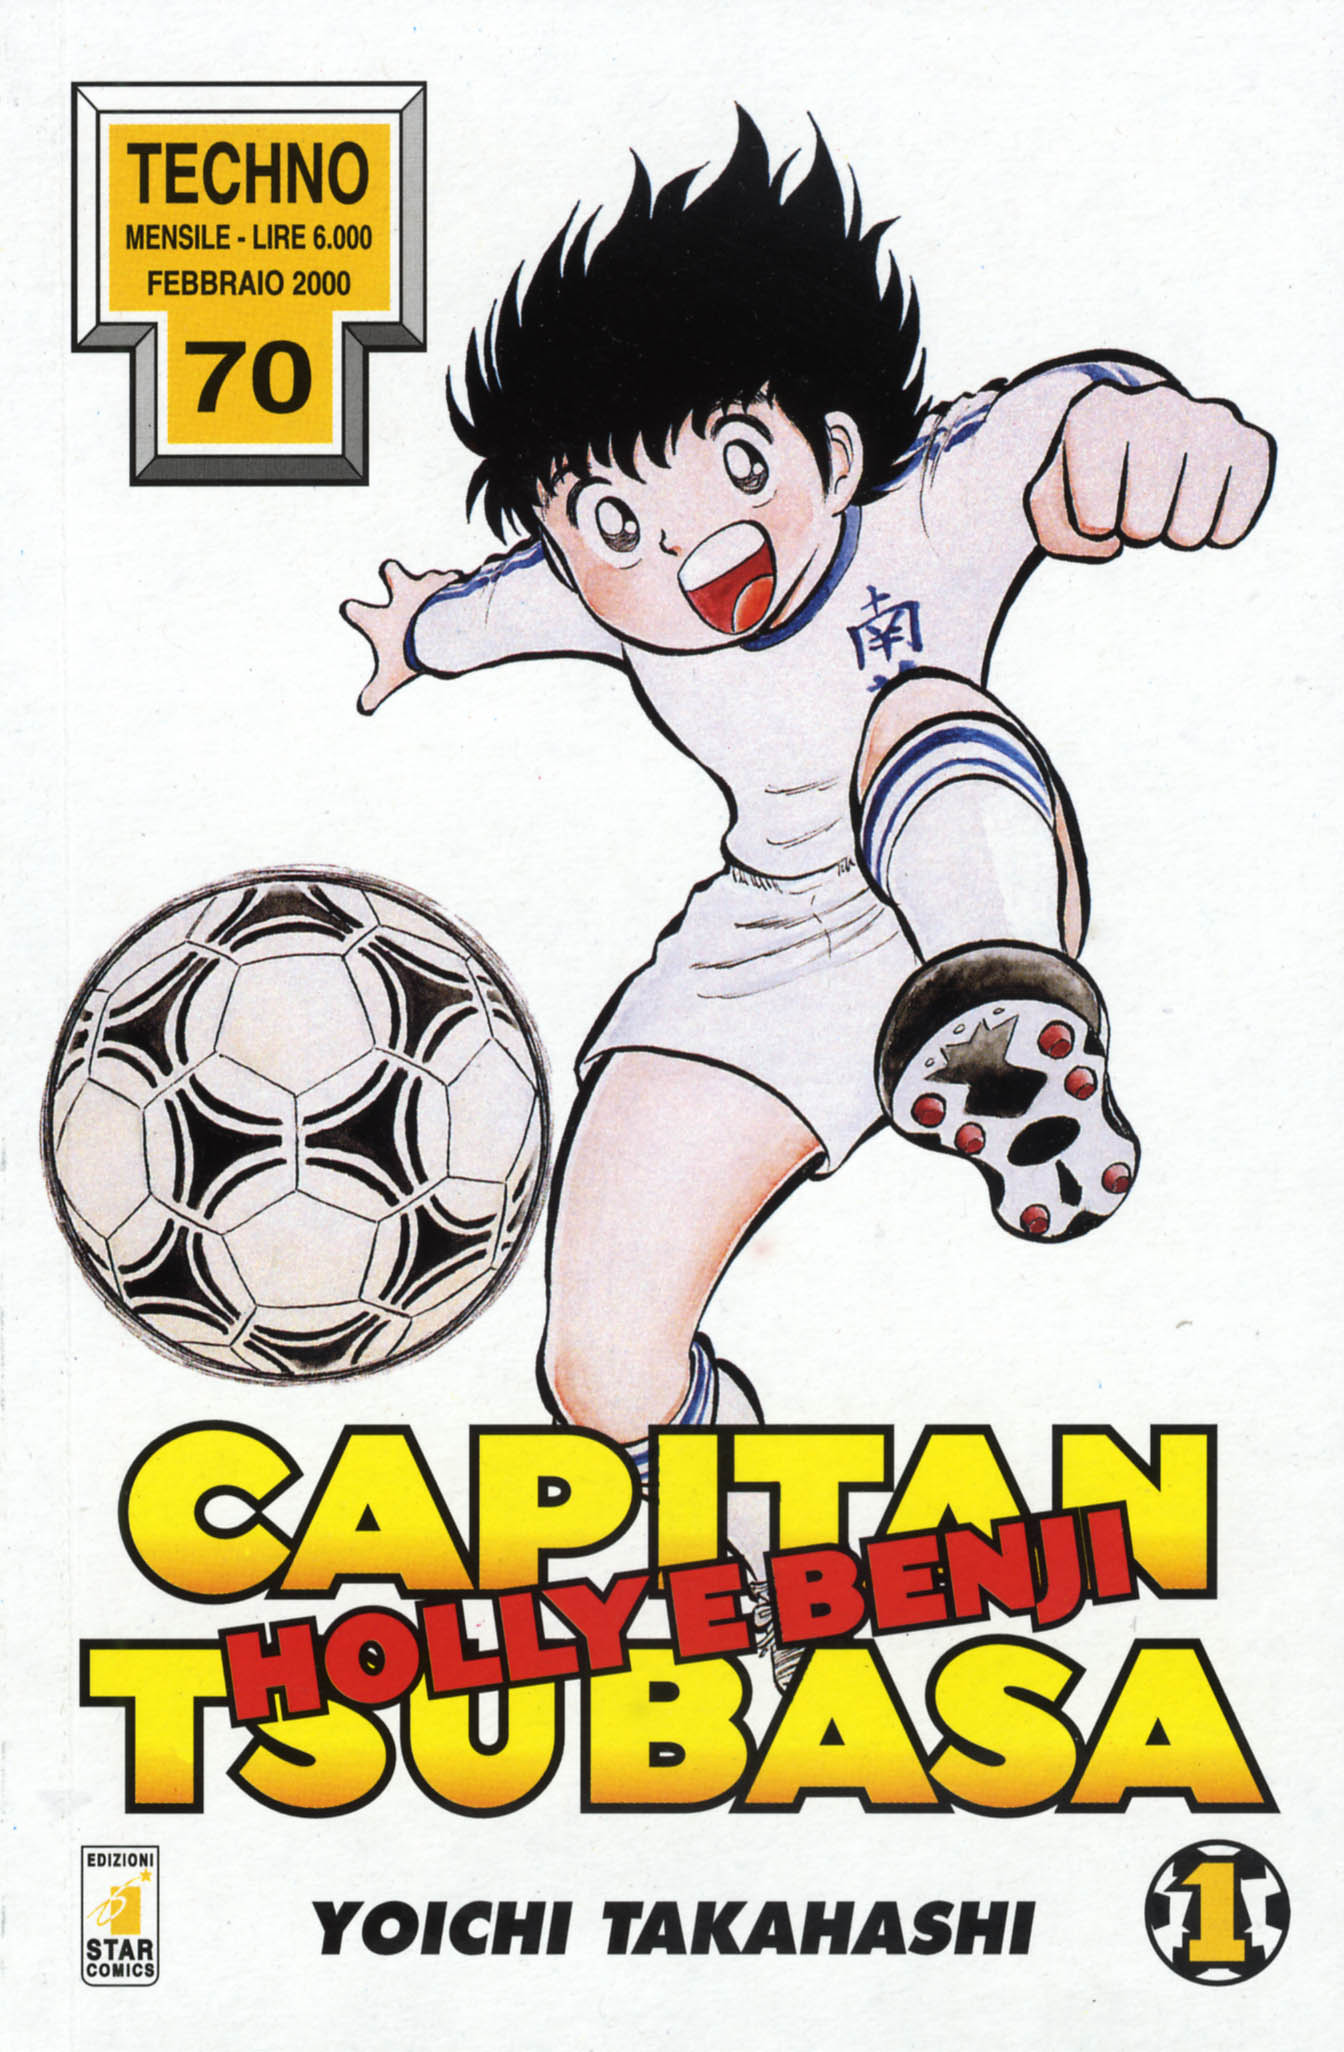 http://upload.wikimedia.org/wikipedia/it/a/a9/Capitan-tsubasa.jpg